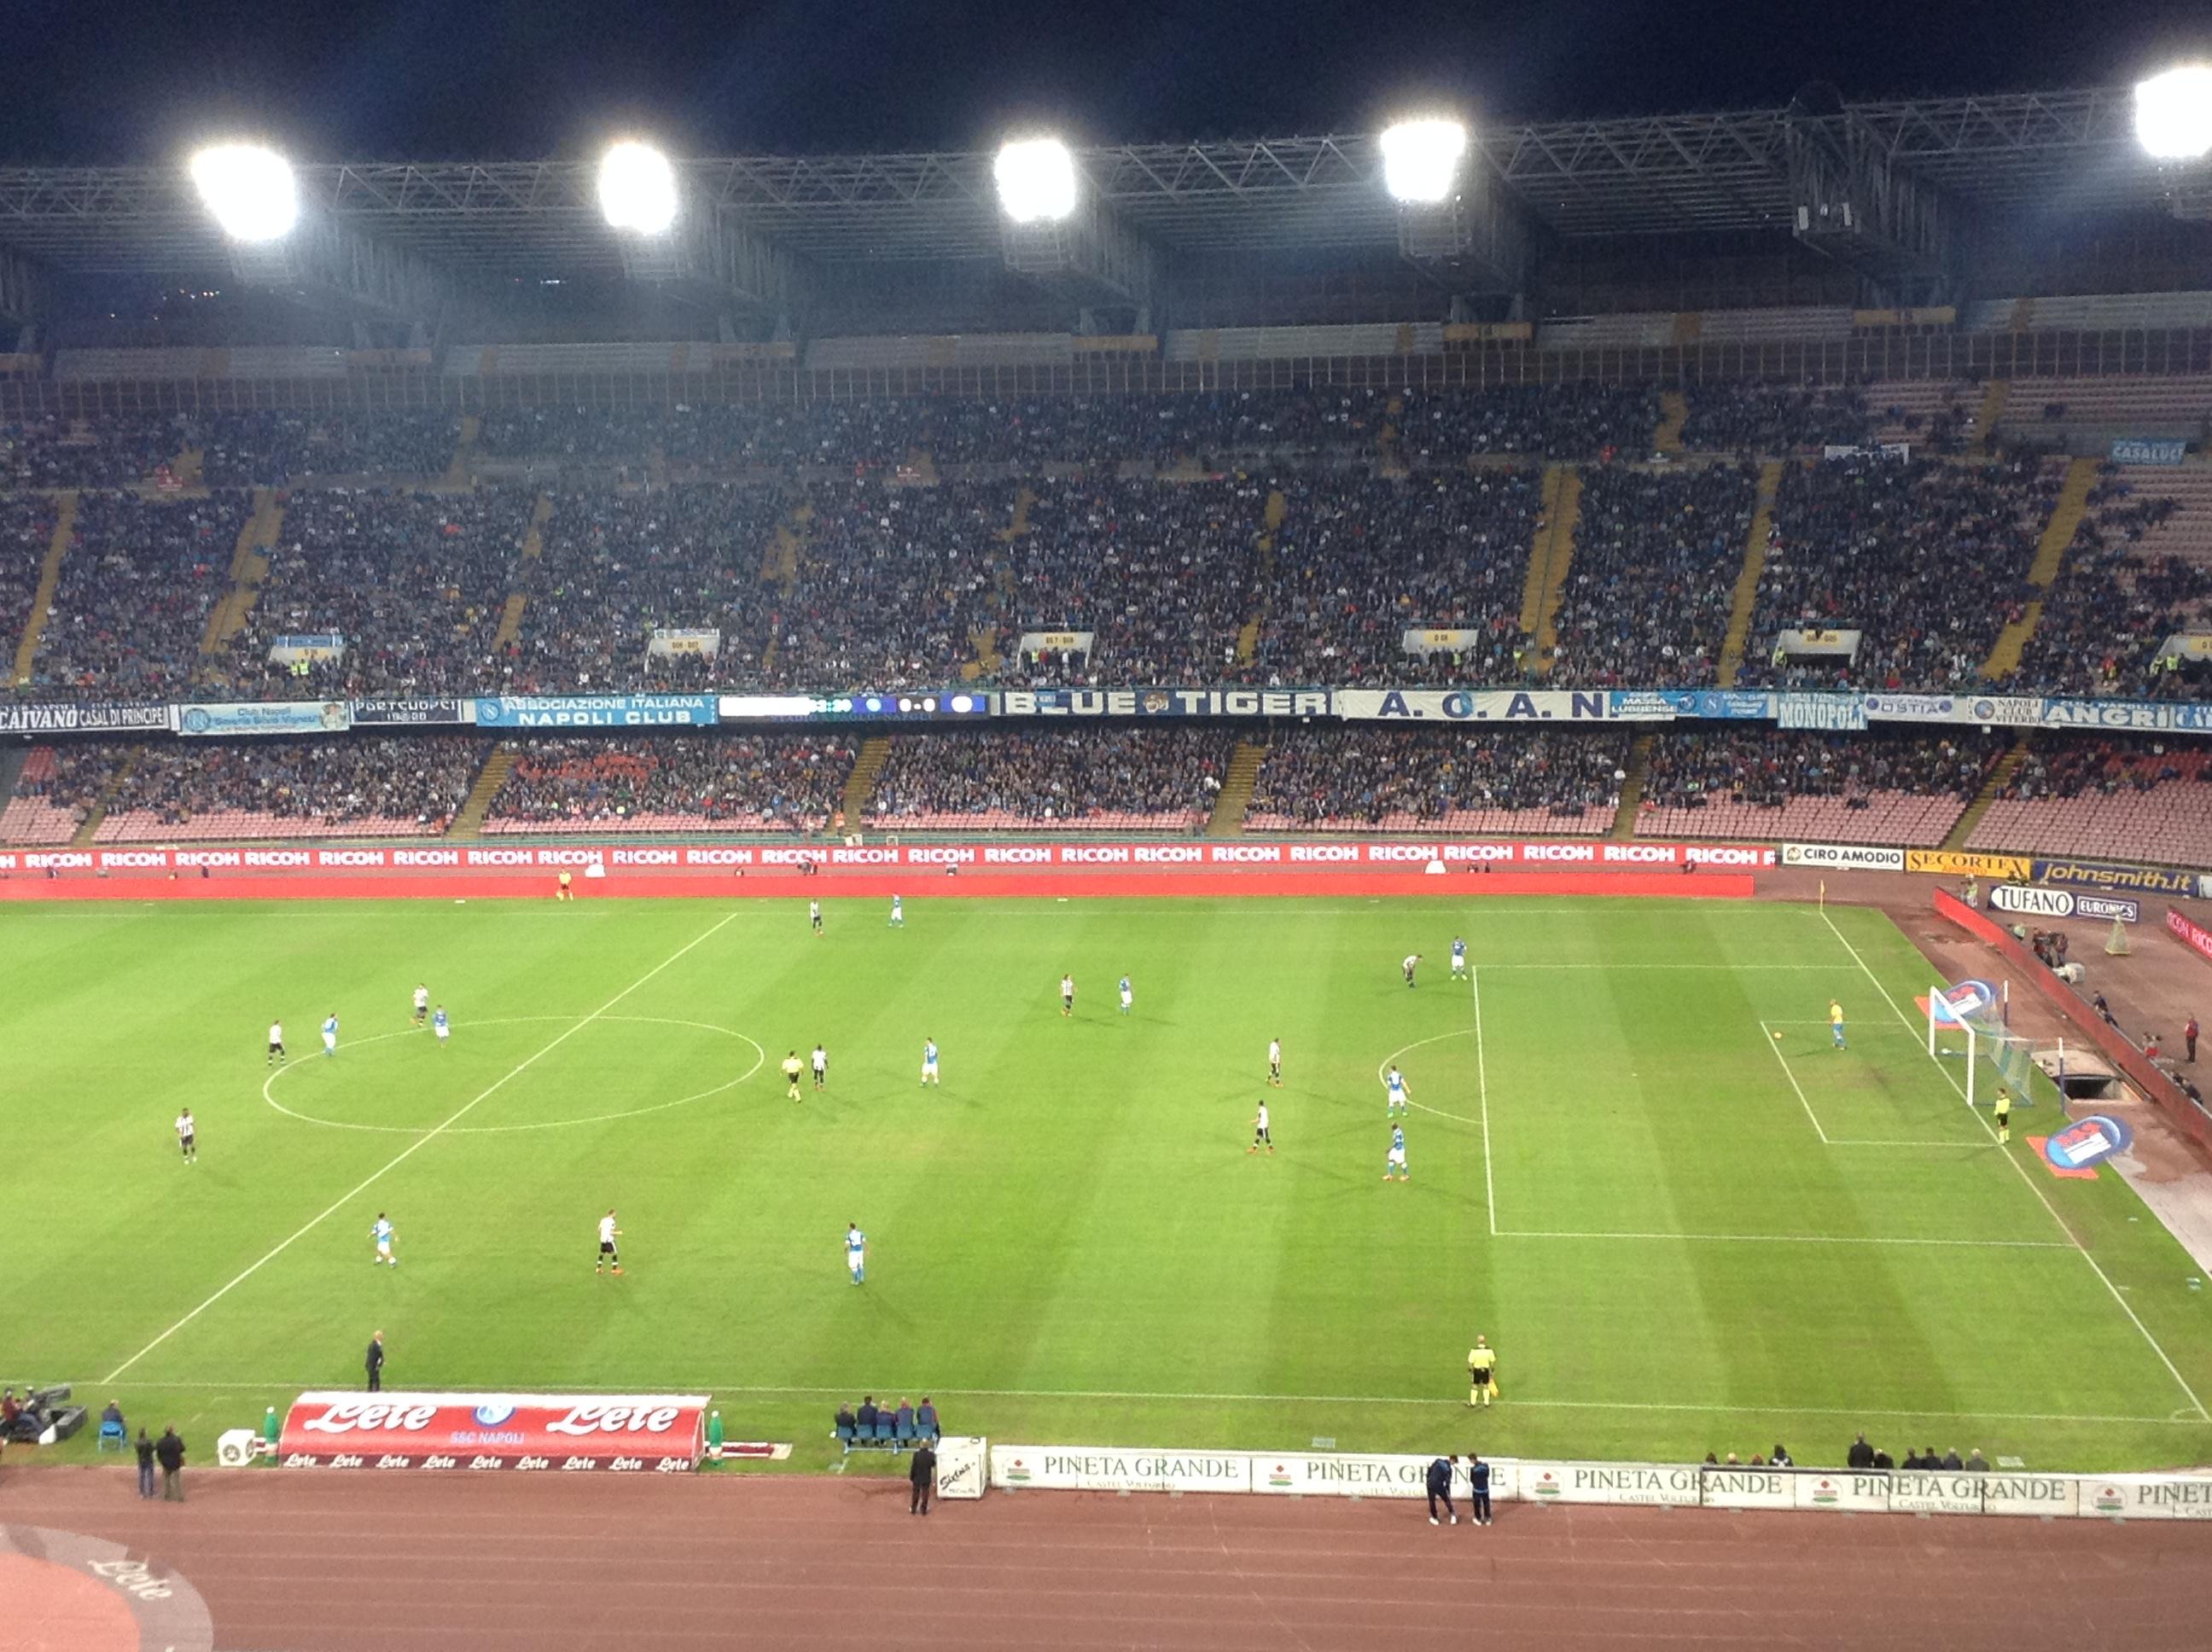 Napoli Udinese 1-0, Higuaín porta il Napoli al 3 posto